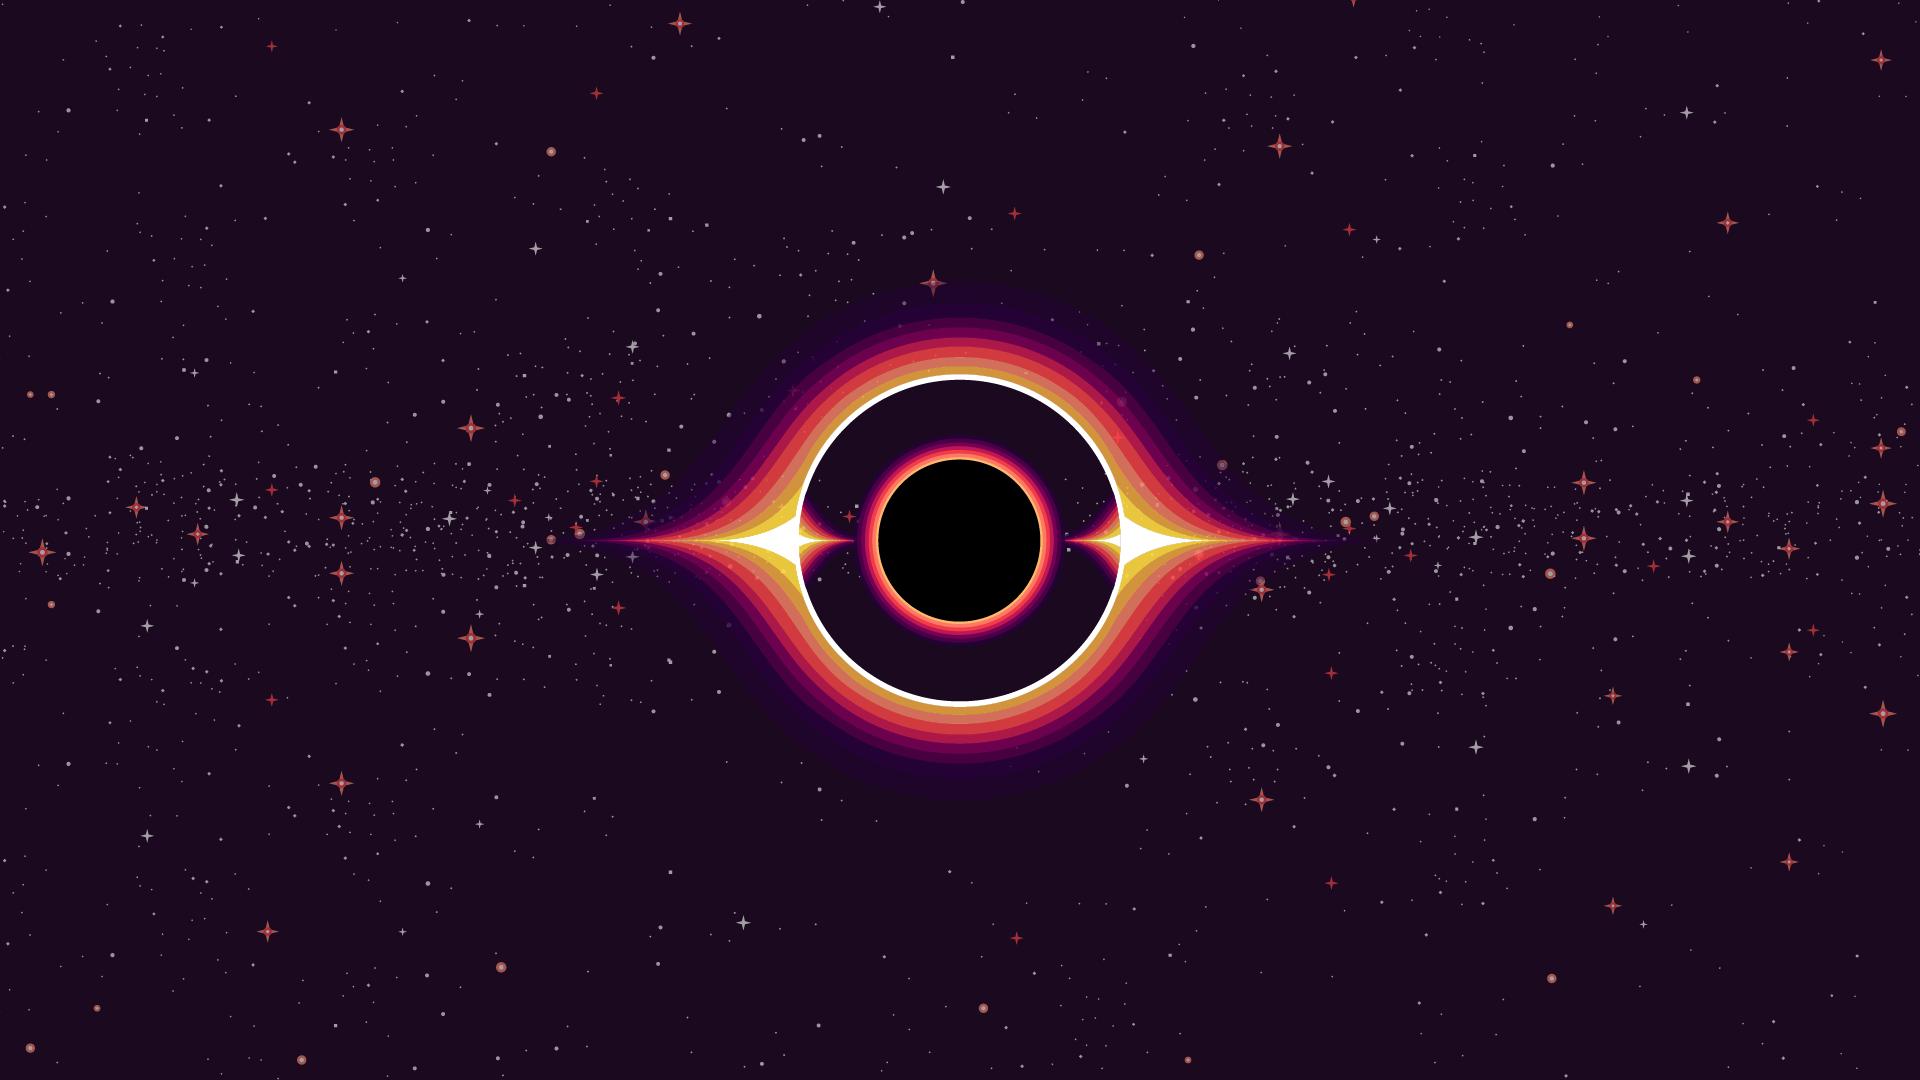 Black hole Kurzgesagt style[1920 x 1080] in 2019 Black hole 1920x1080